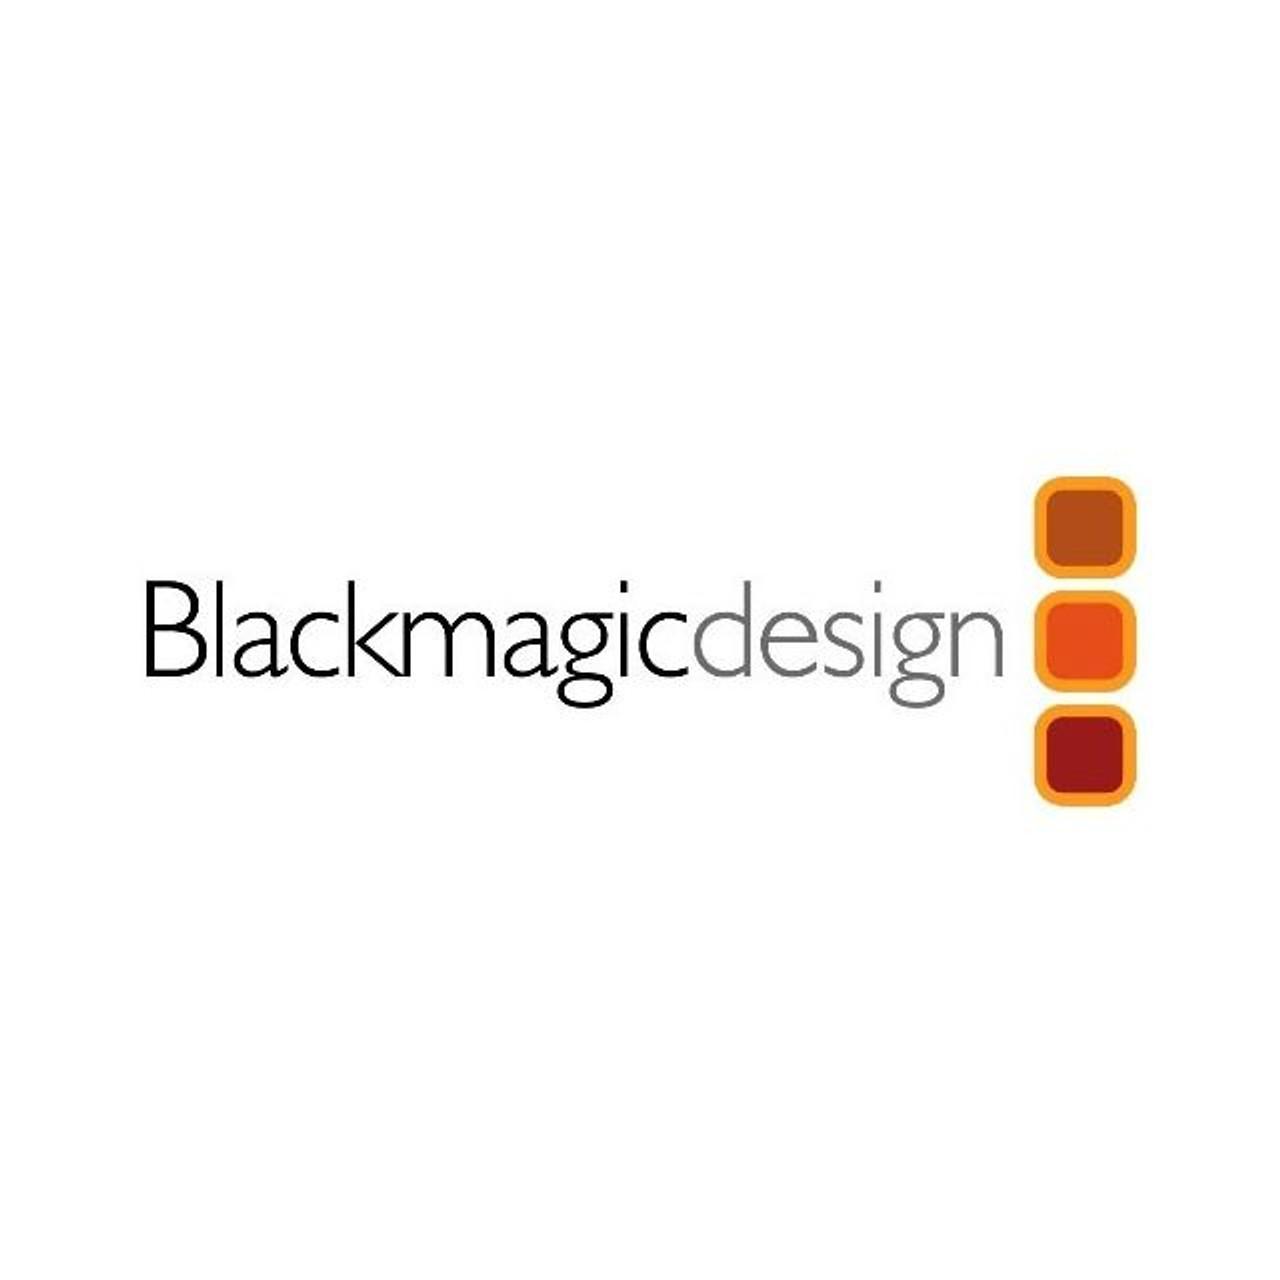 Blackmagic Design Decklink Duo 2 Sdi Playback And Capture Card